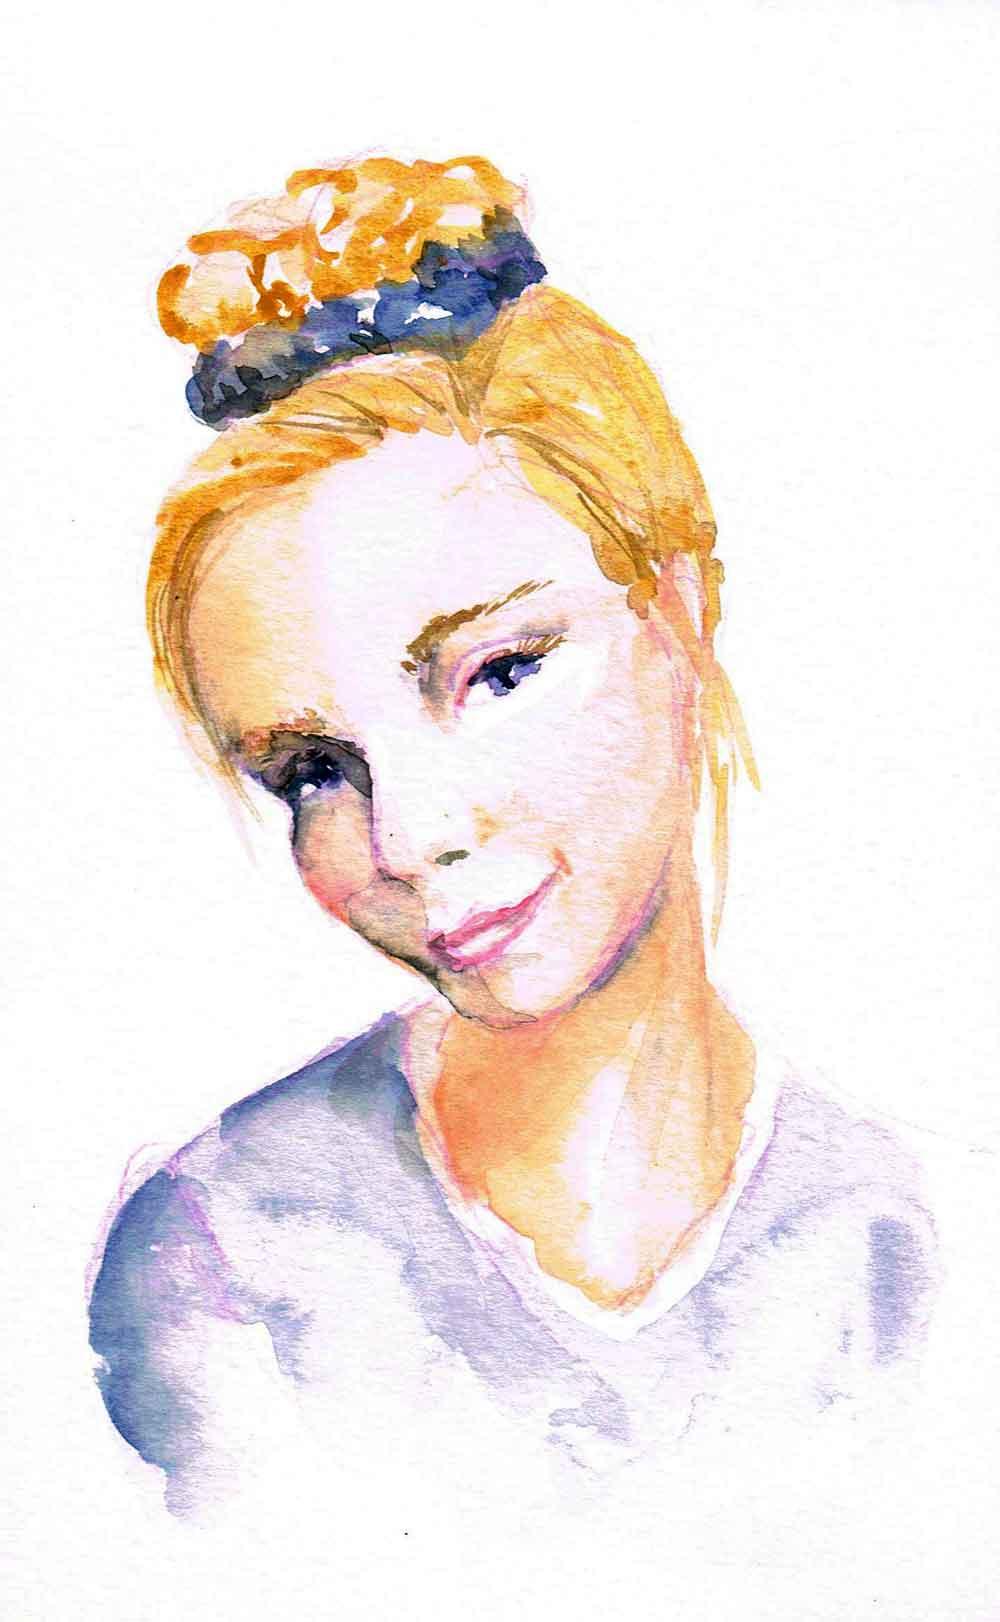 Watercolour-Portraits-7-shy-kw.jpg